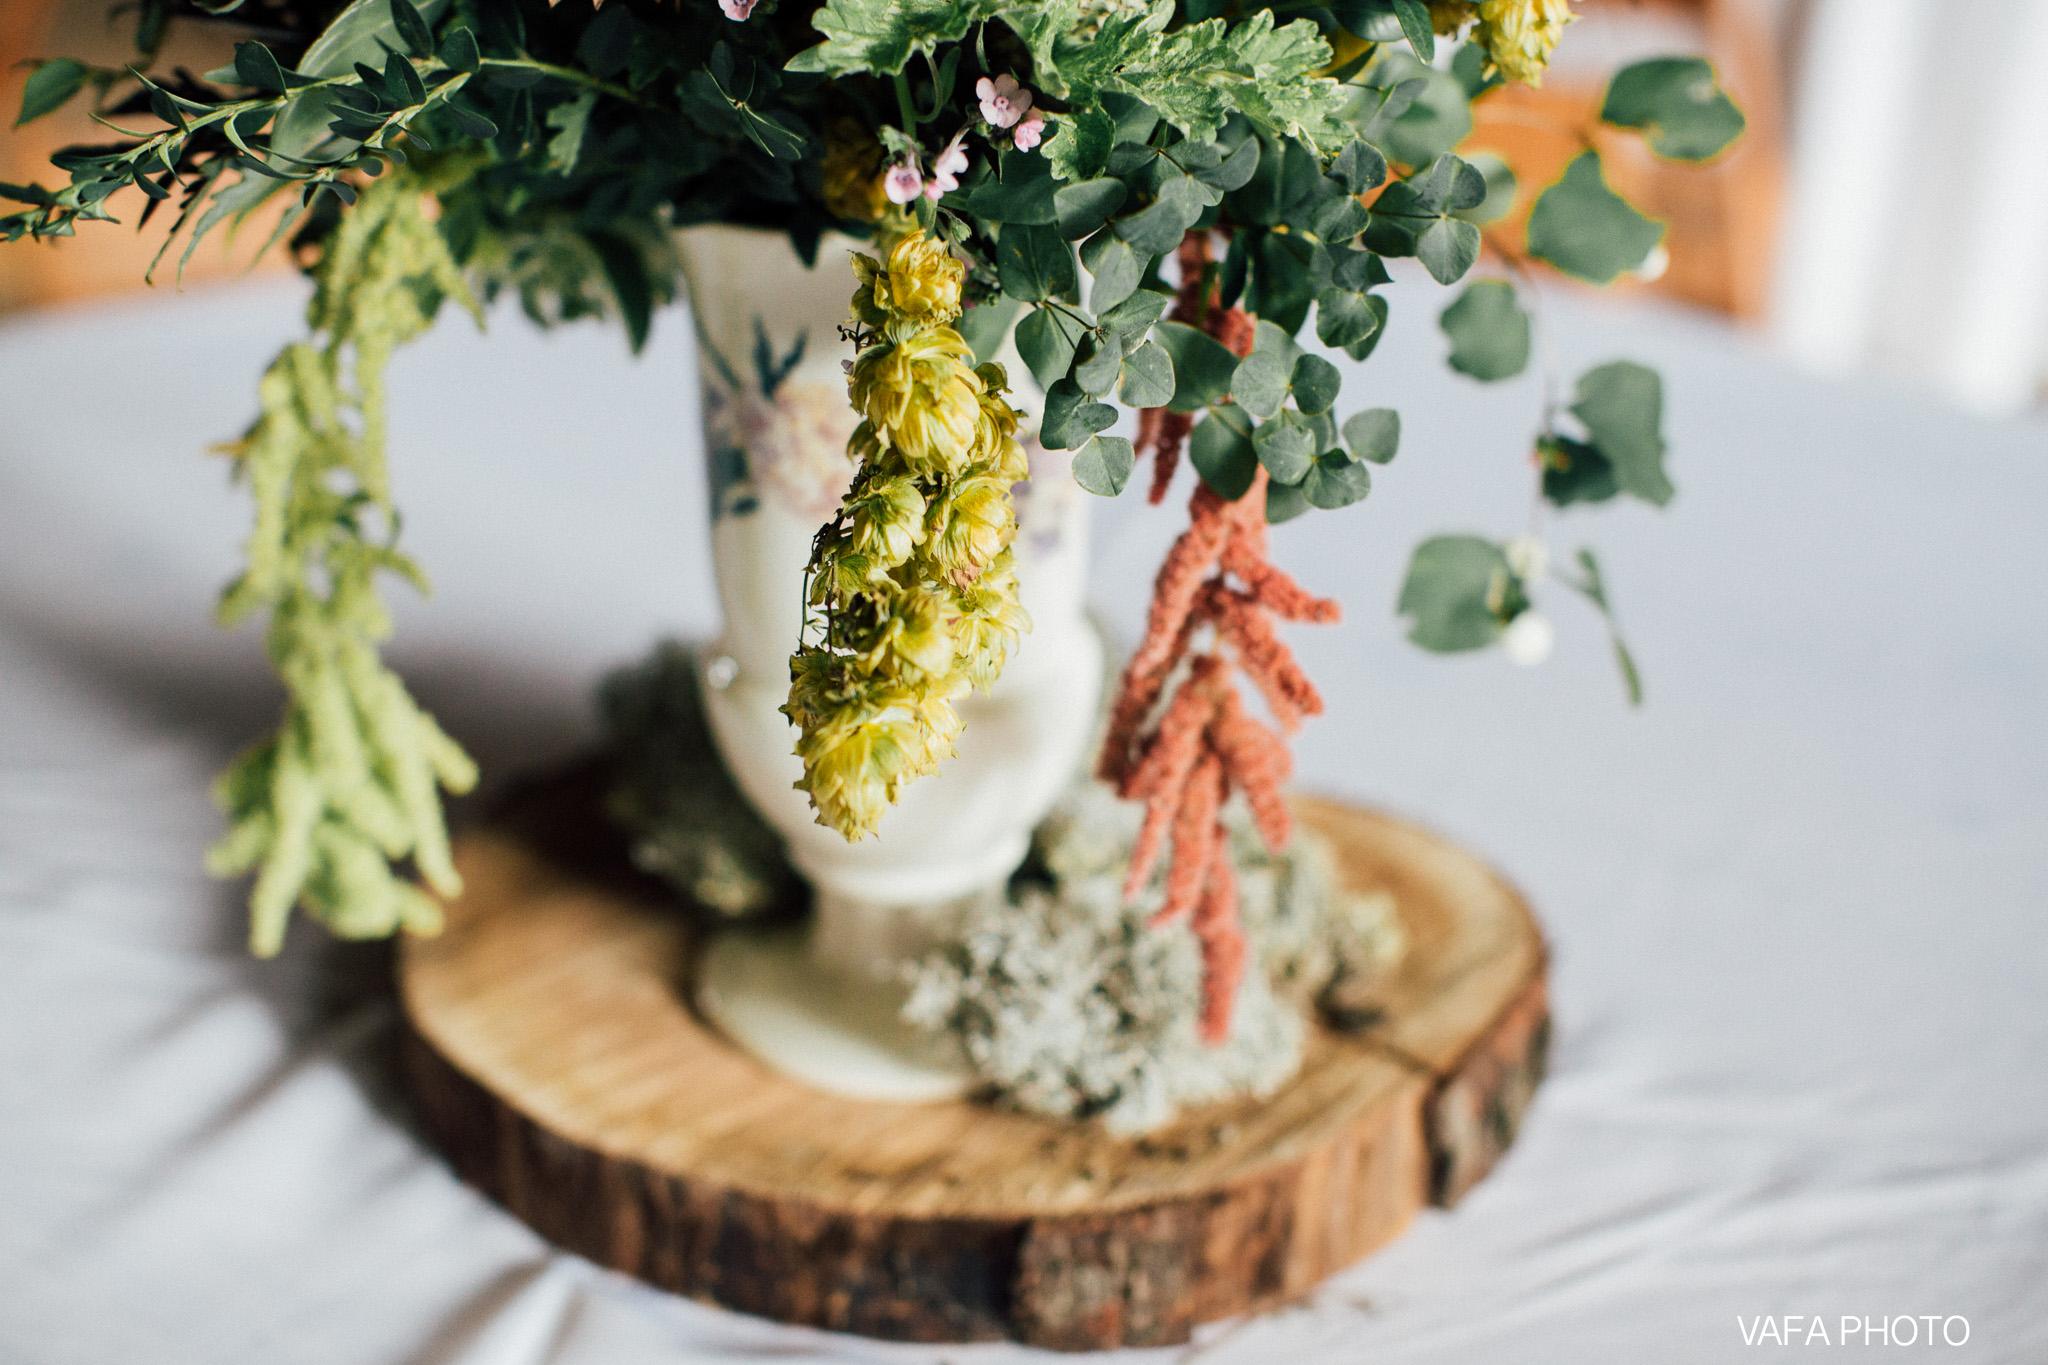 Belsolda-Farm-Wedding-Christy-Eric-Vafa-Photo-298.jpg